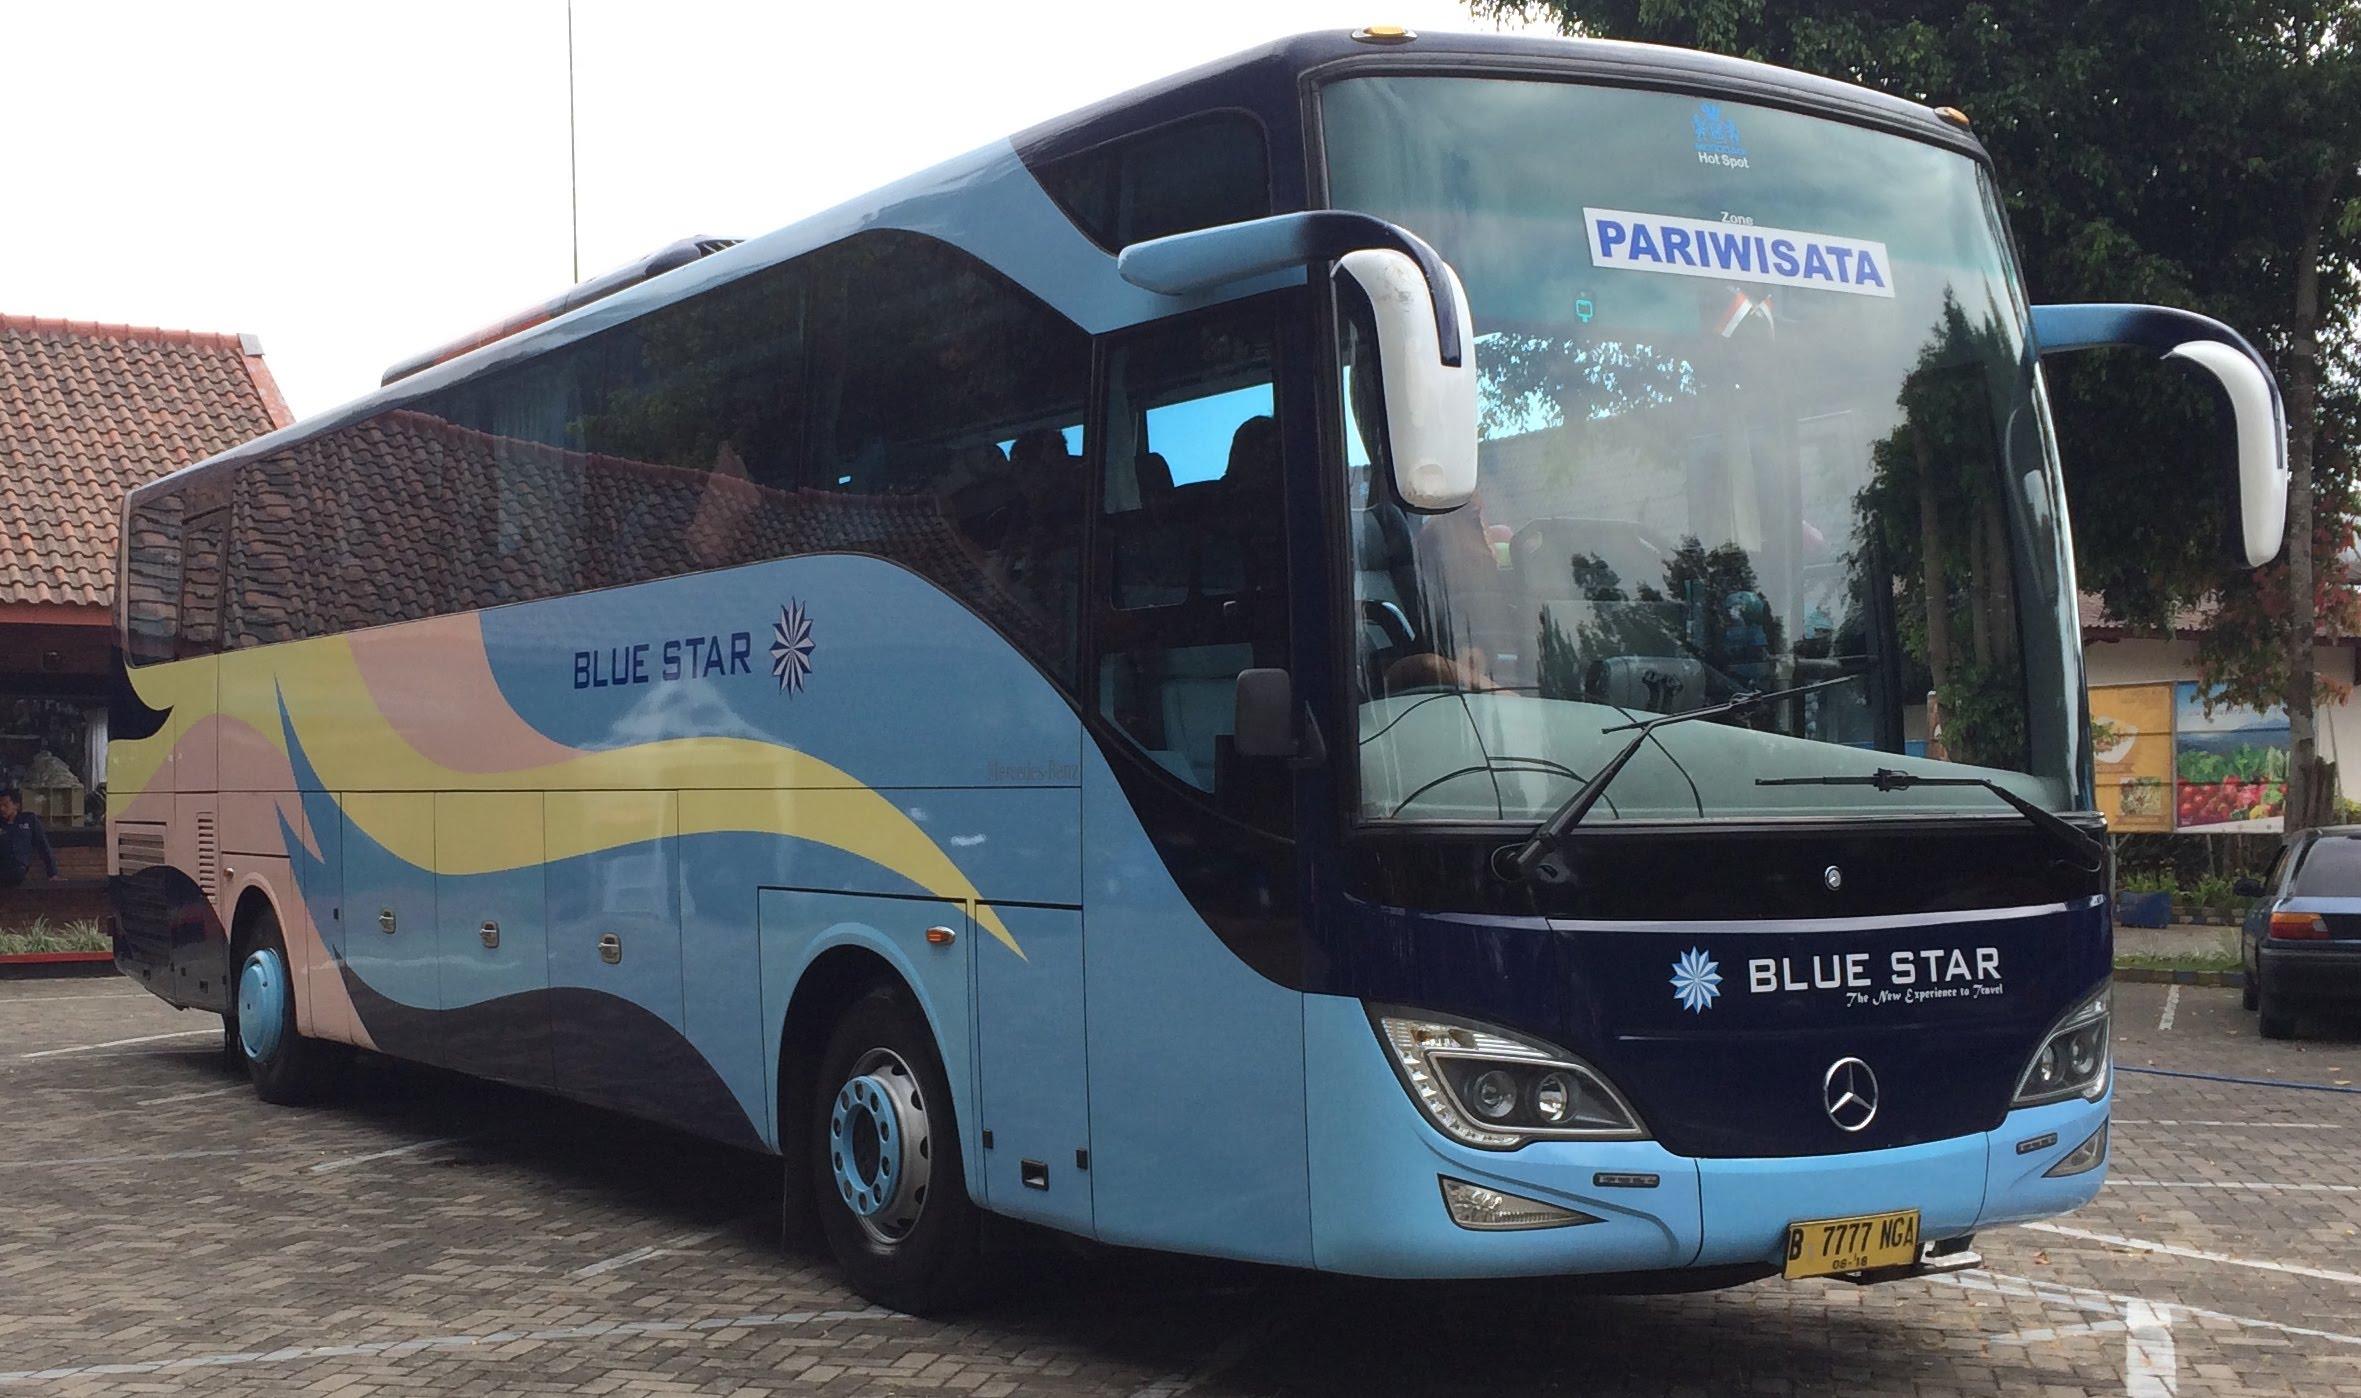 Jenis armada Blue Star - Traveling Seru dengan Bus Pariwisata Blue Star